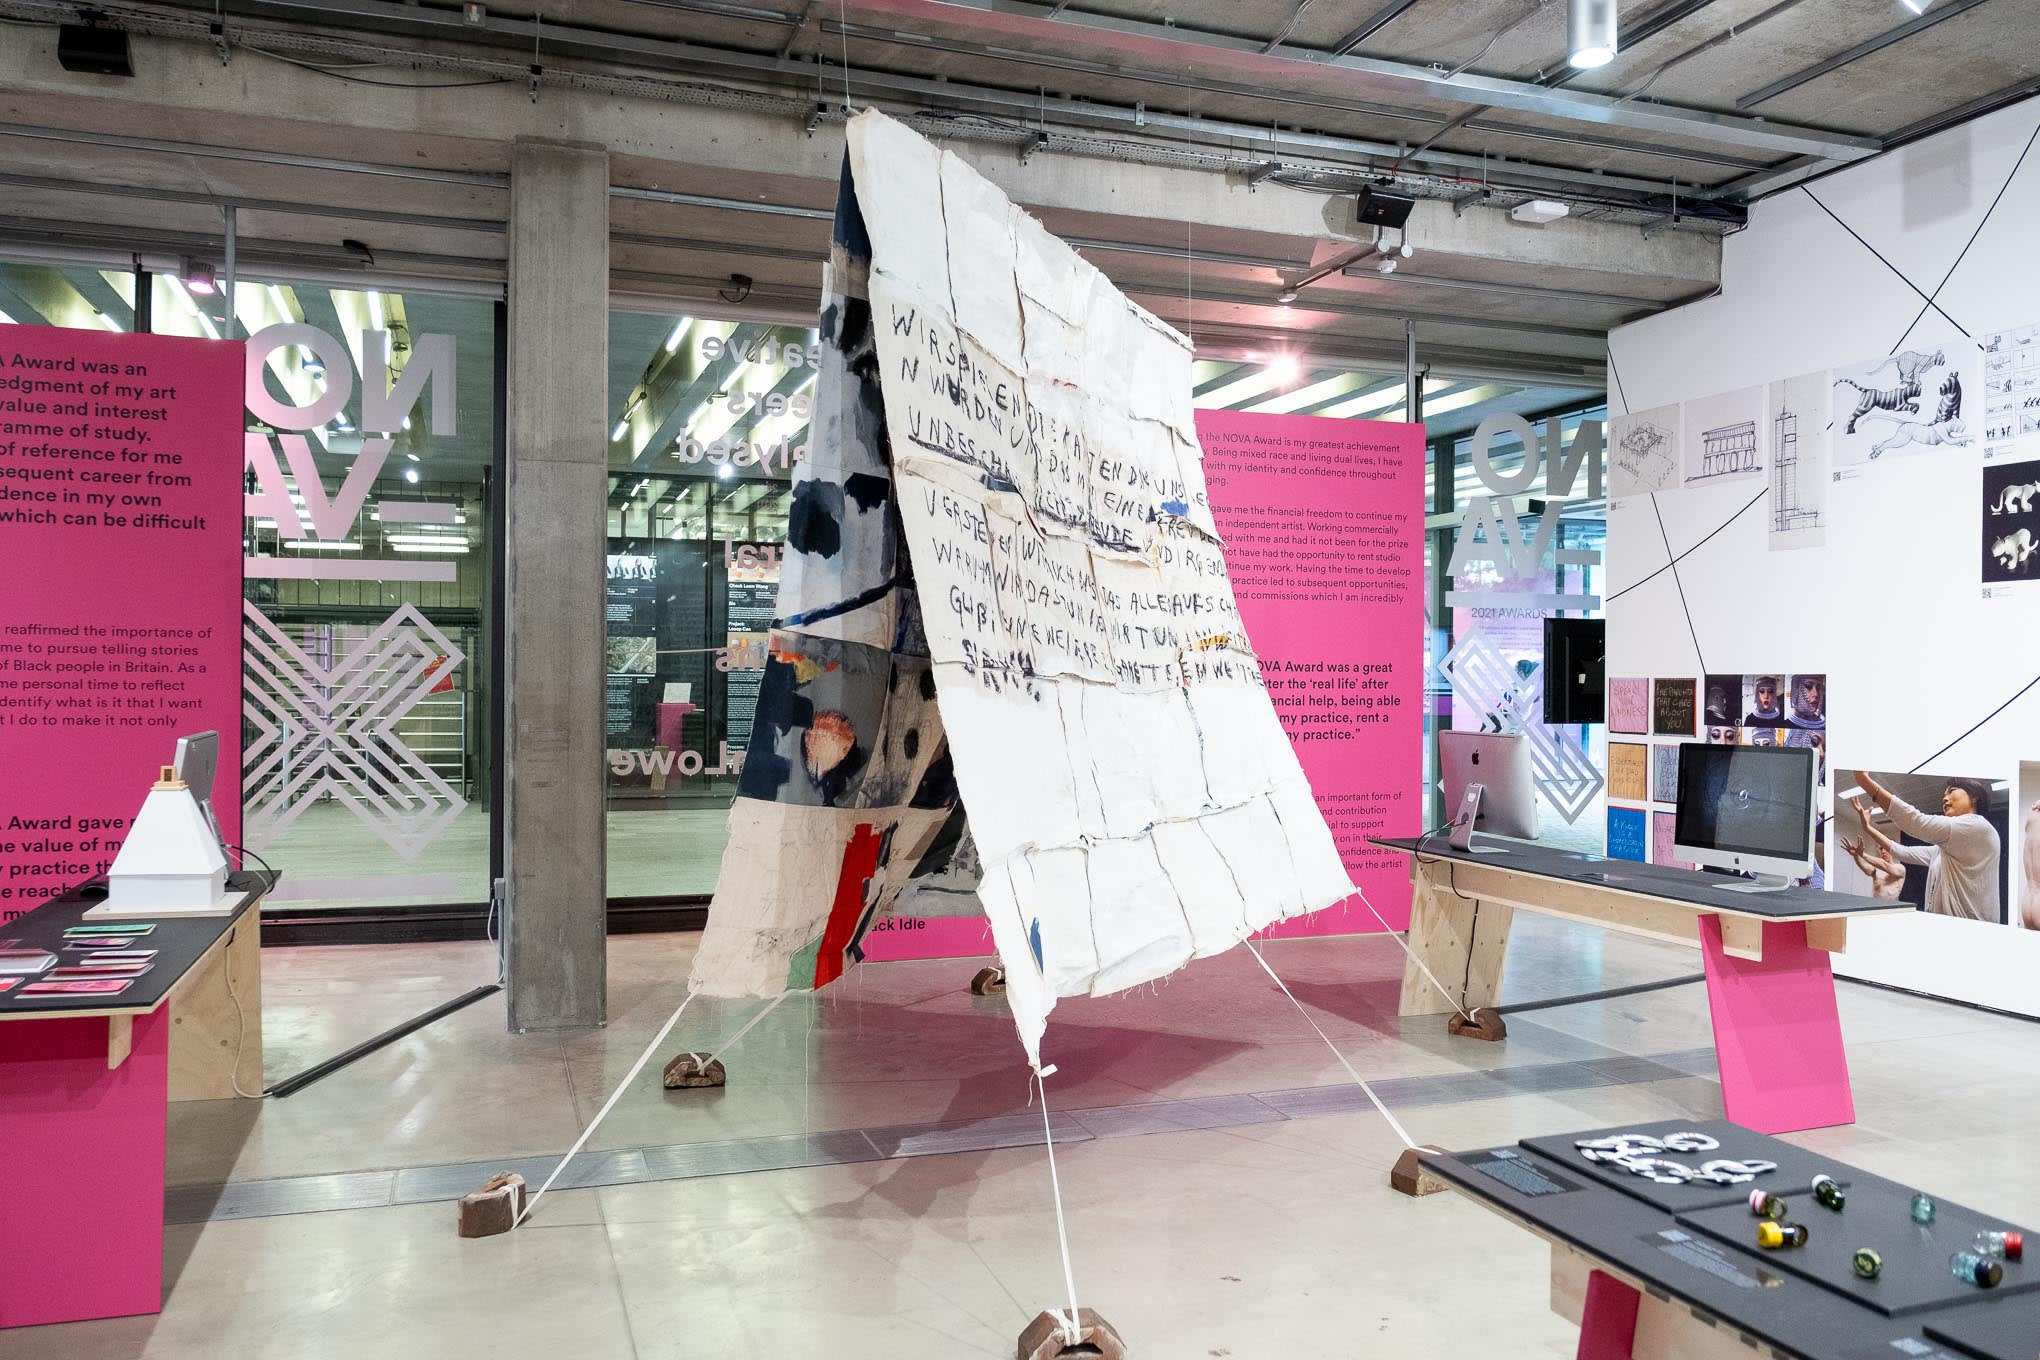 NOVA-X_Exhibition_Low-Res-41.jpg